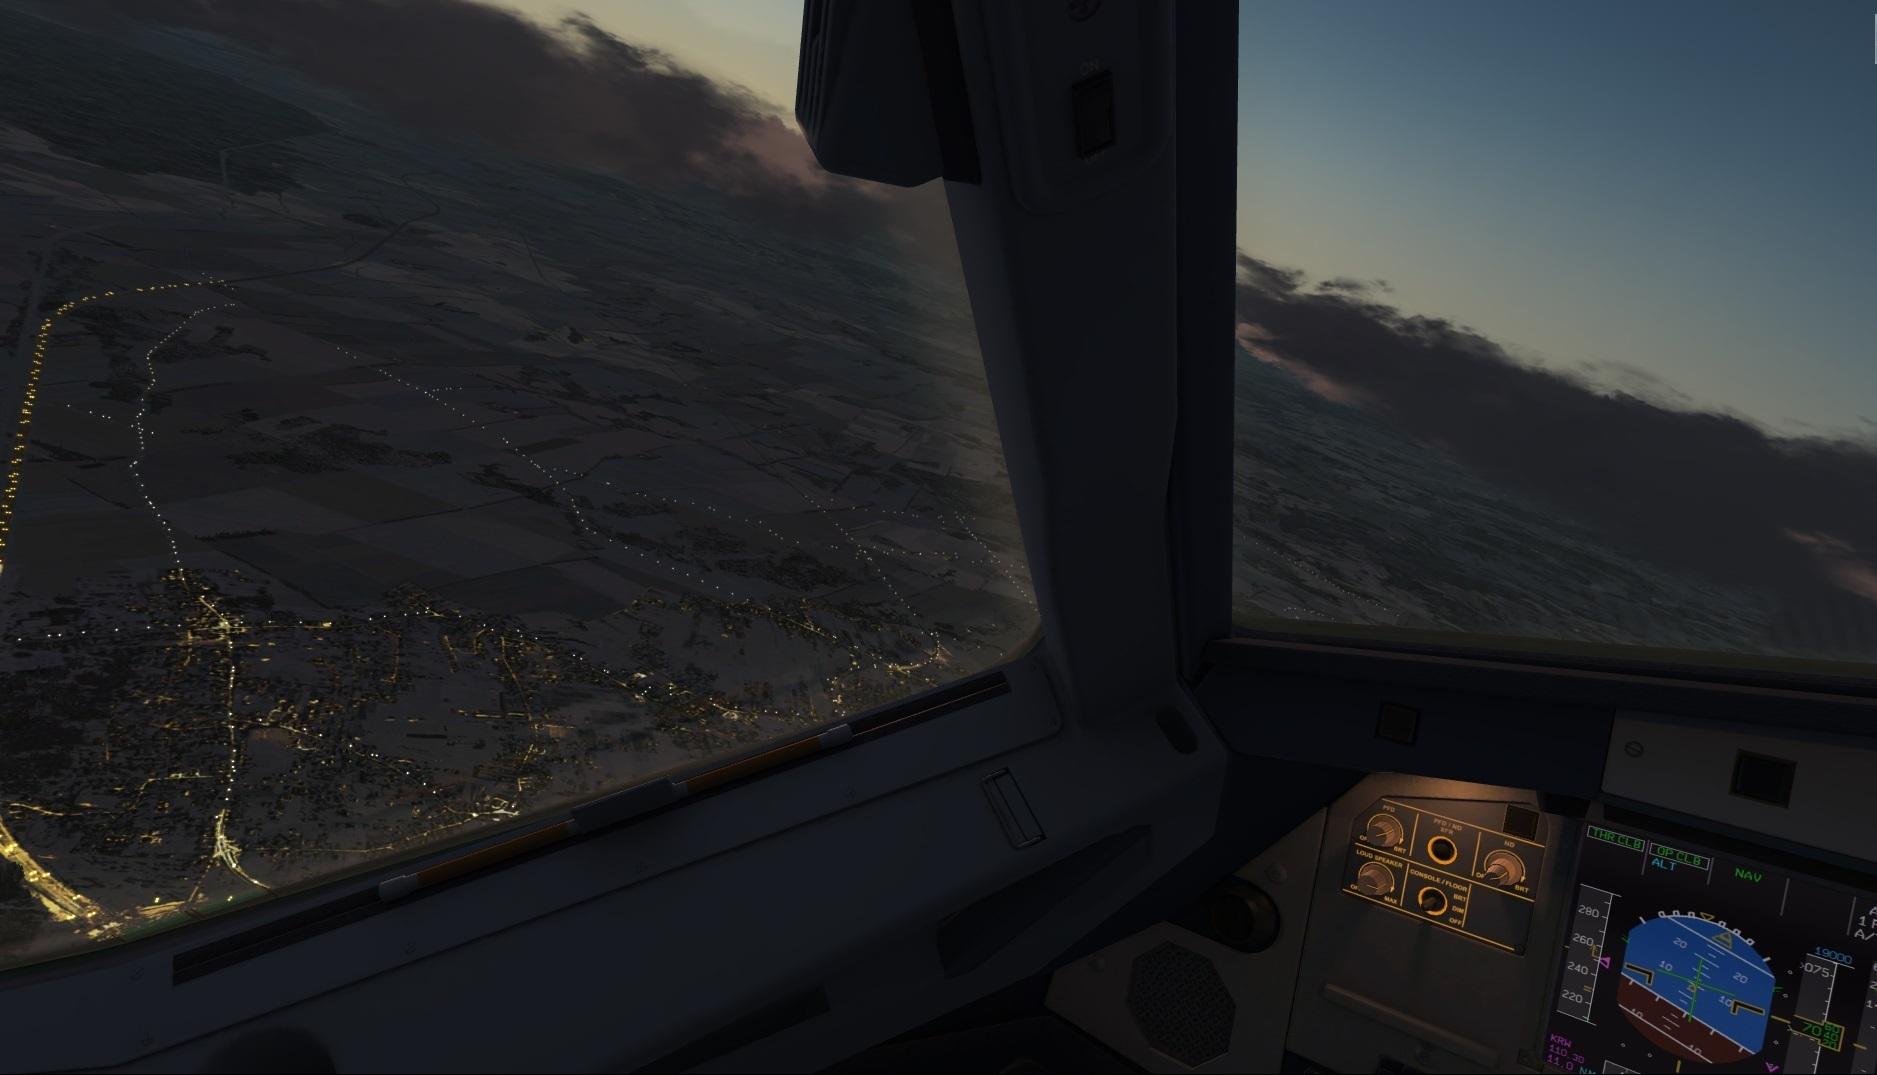 niki_takeoffp2kzk.jpg